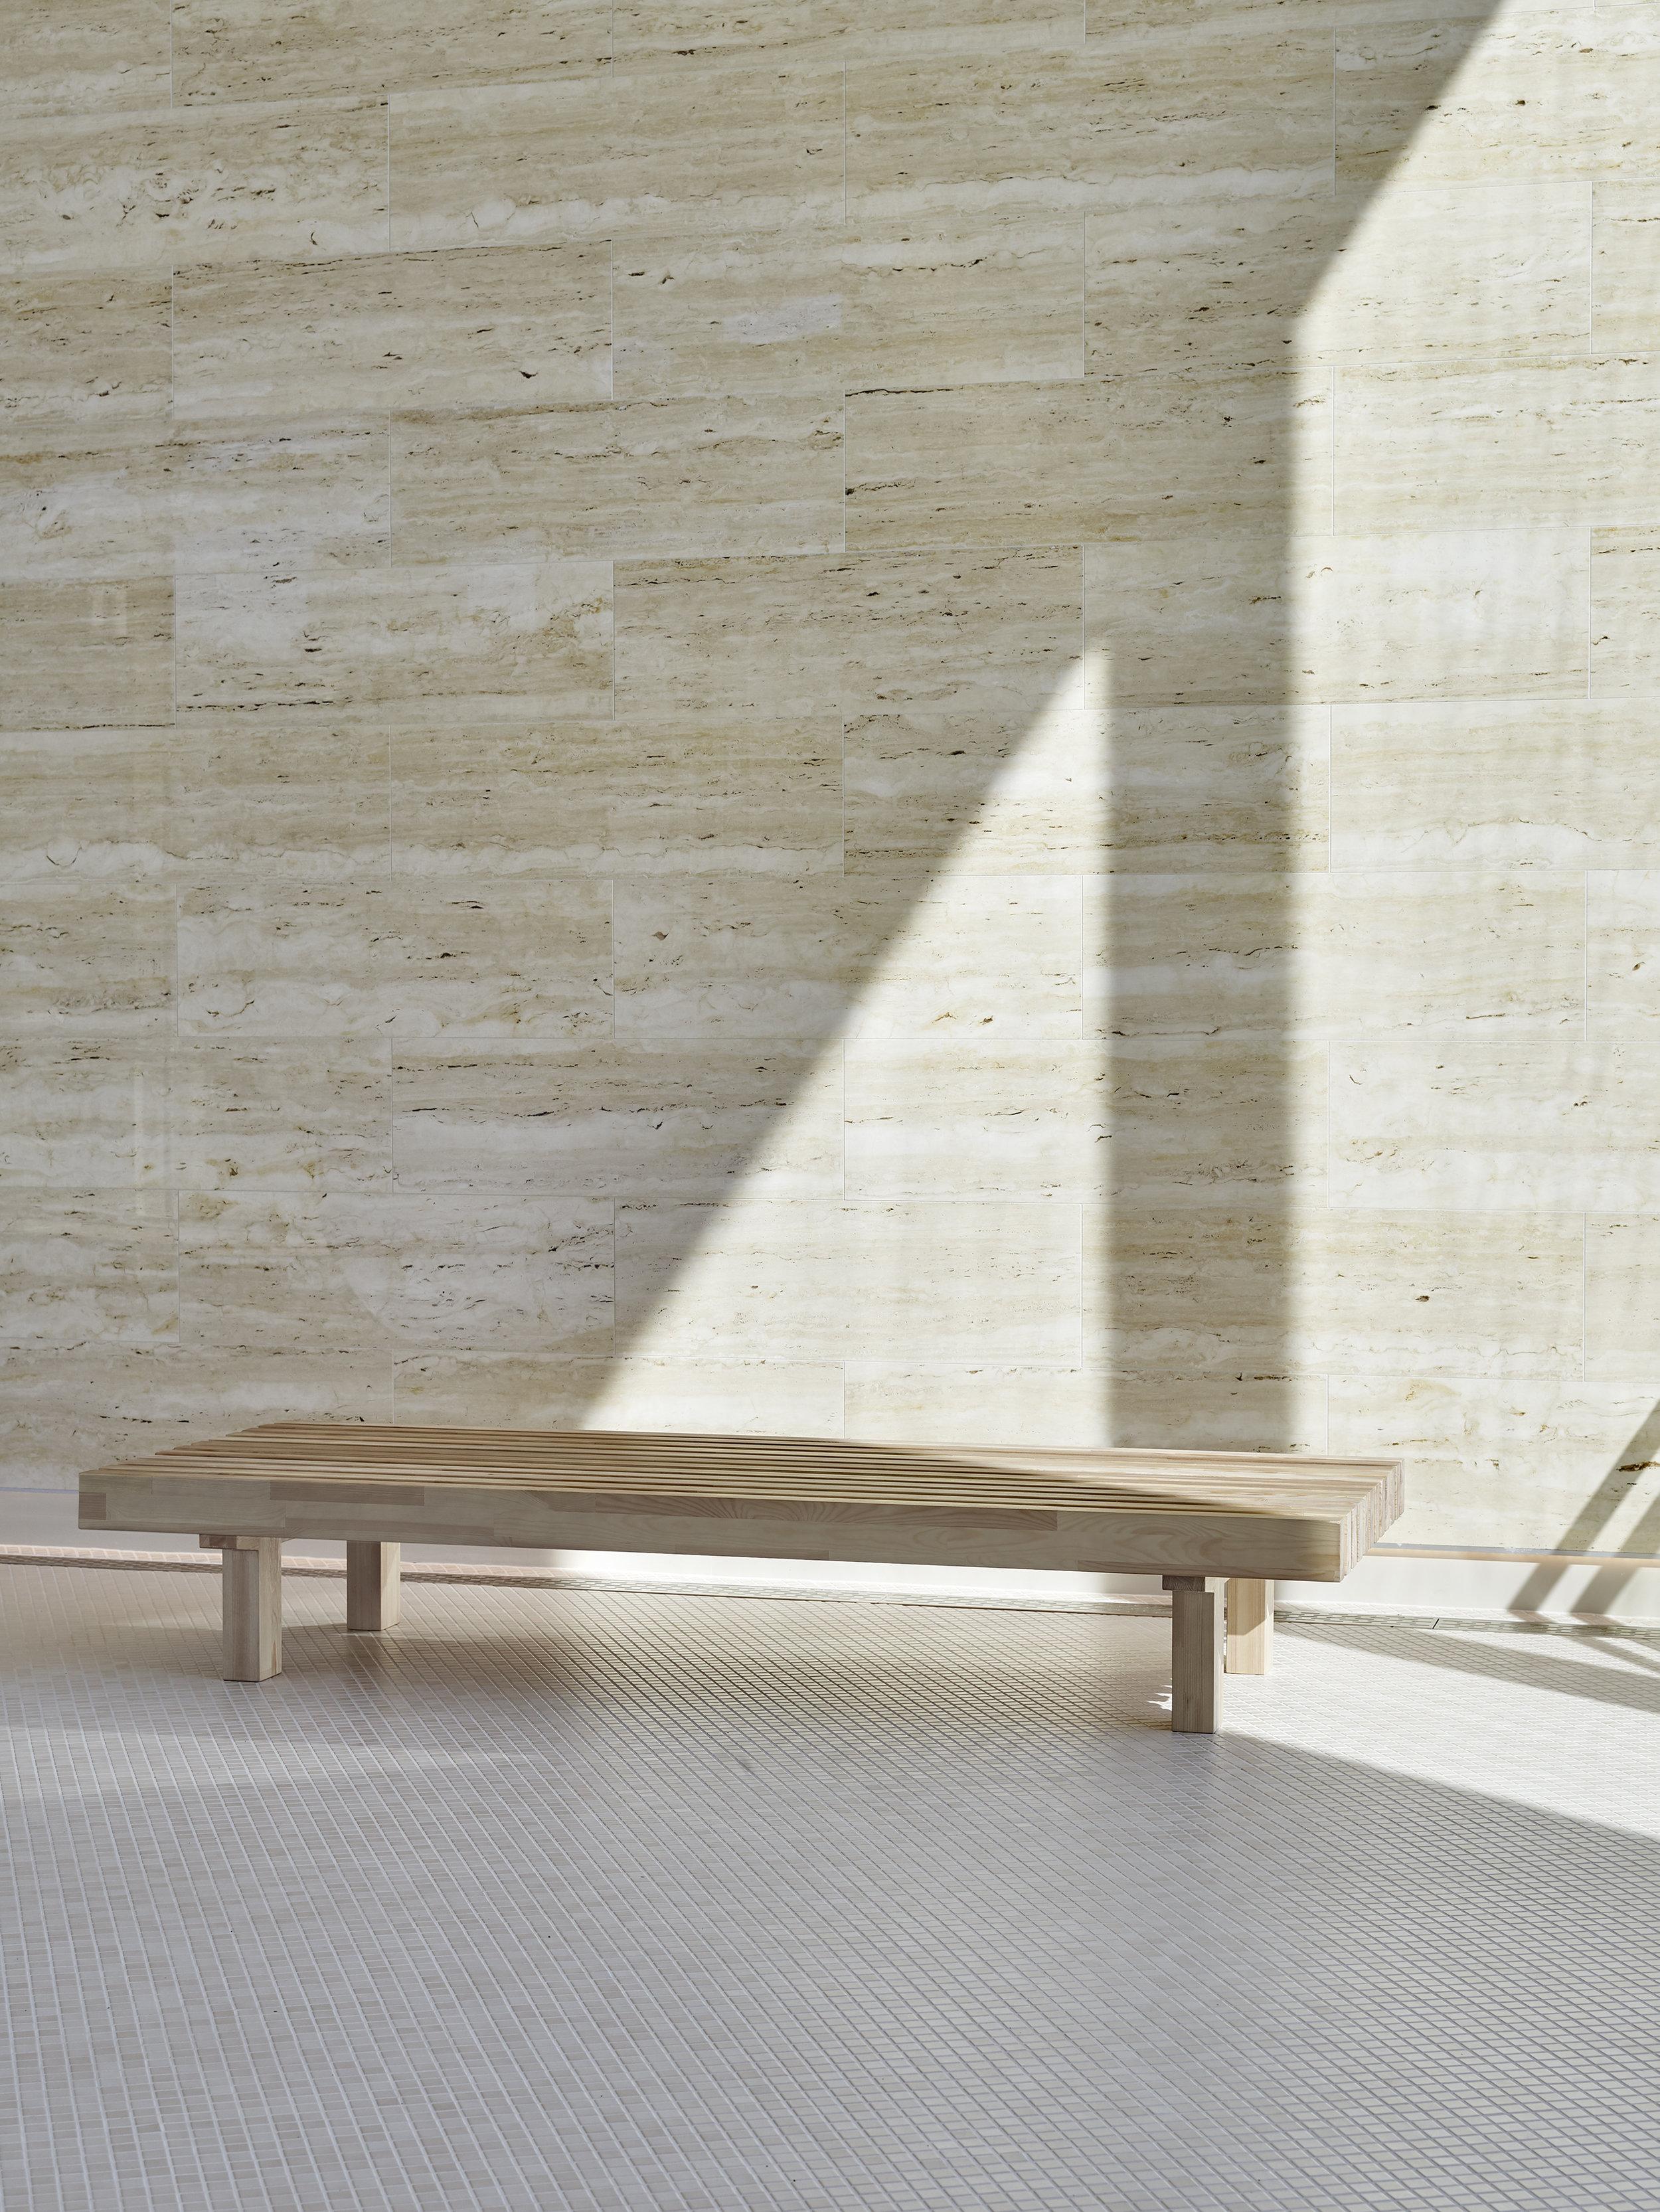 Laveri  bench 80x200 cm.